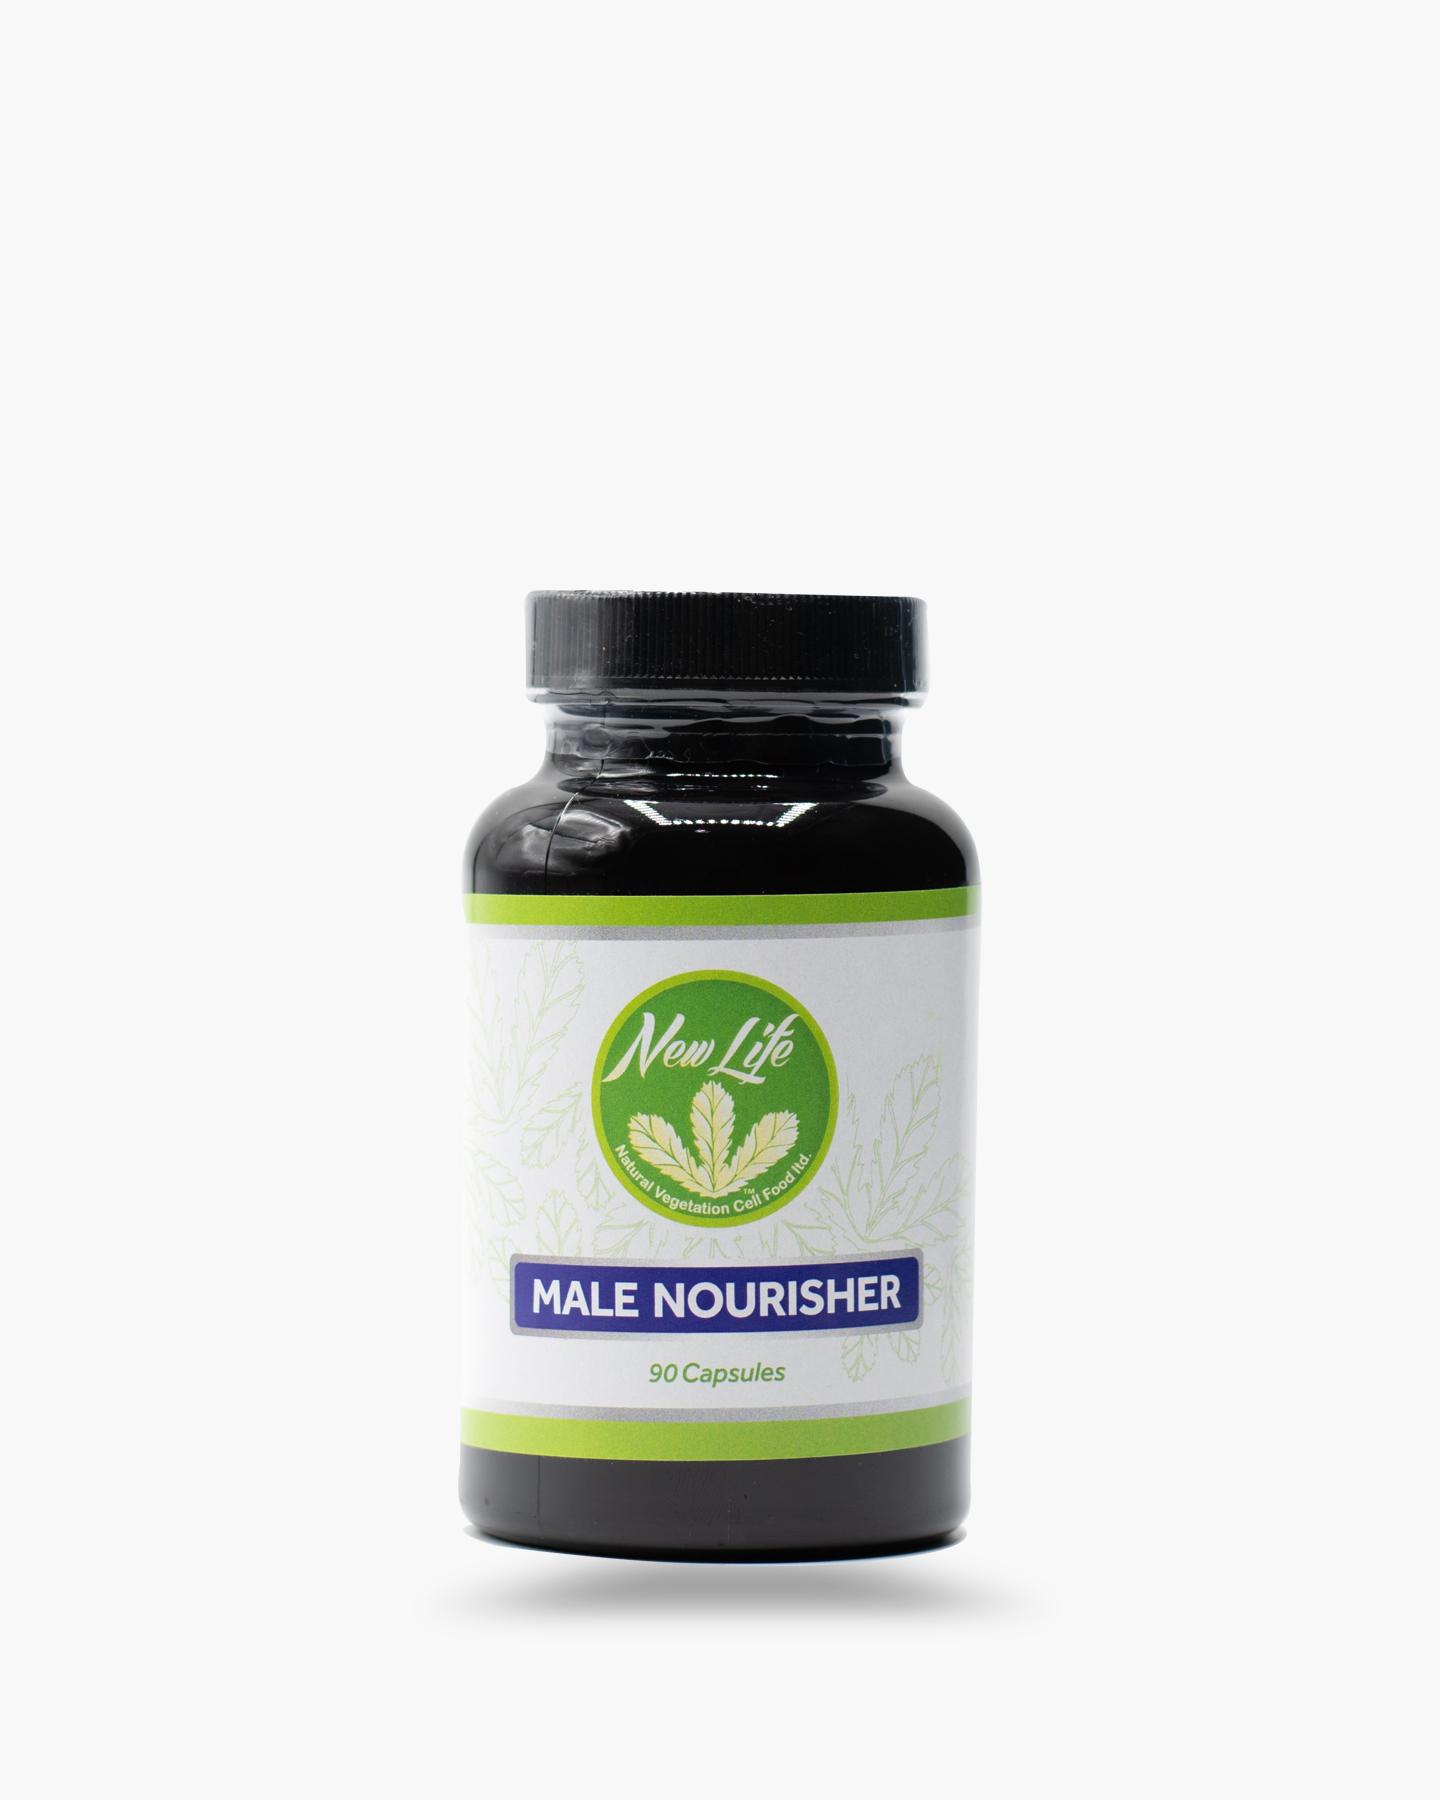 Male Nourisher